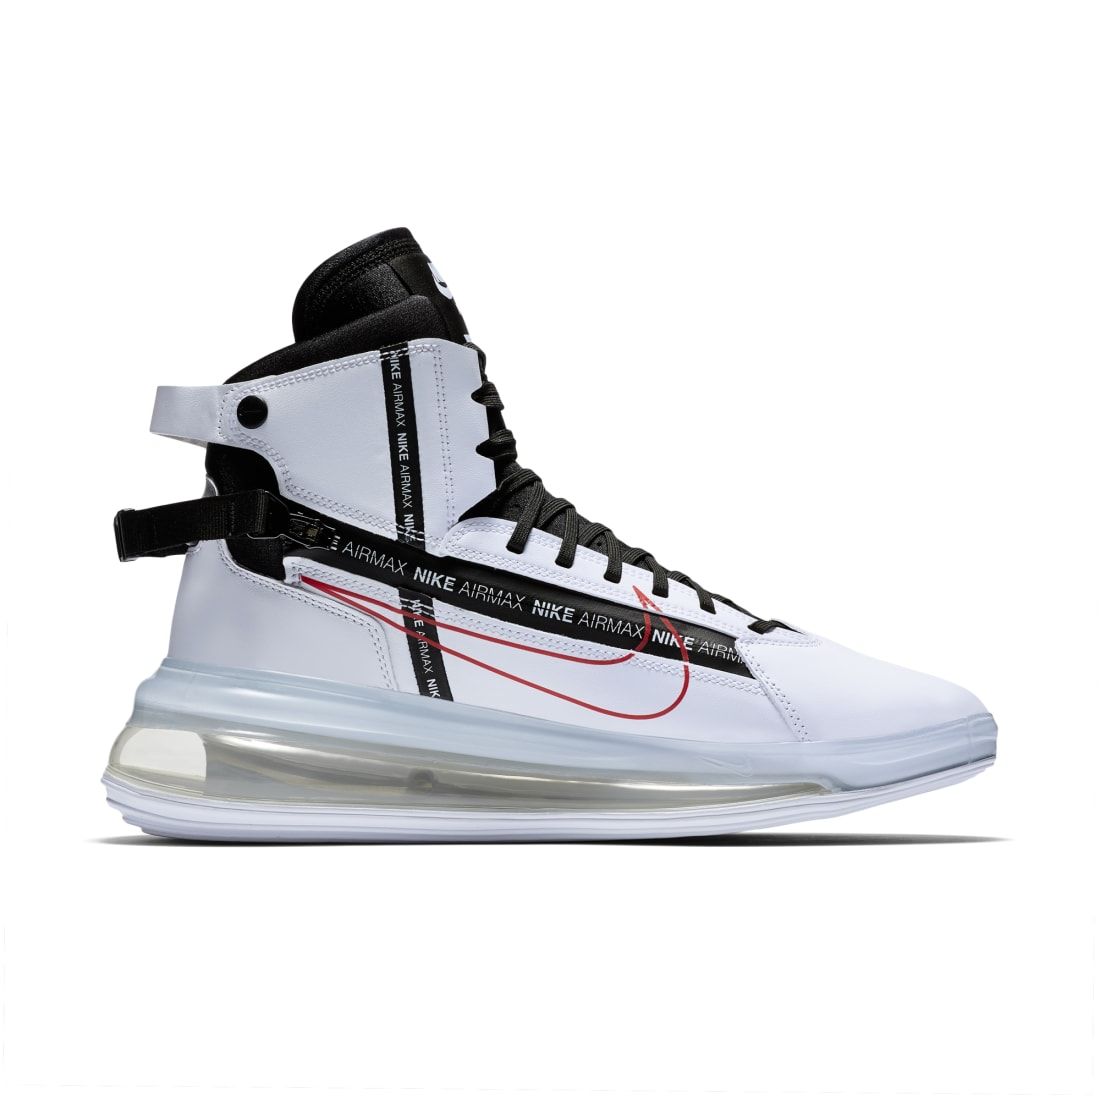 Nike Air Max 720 Saturn White Black Red